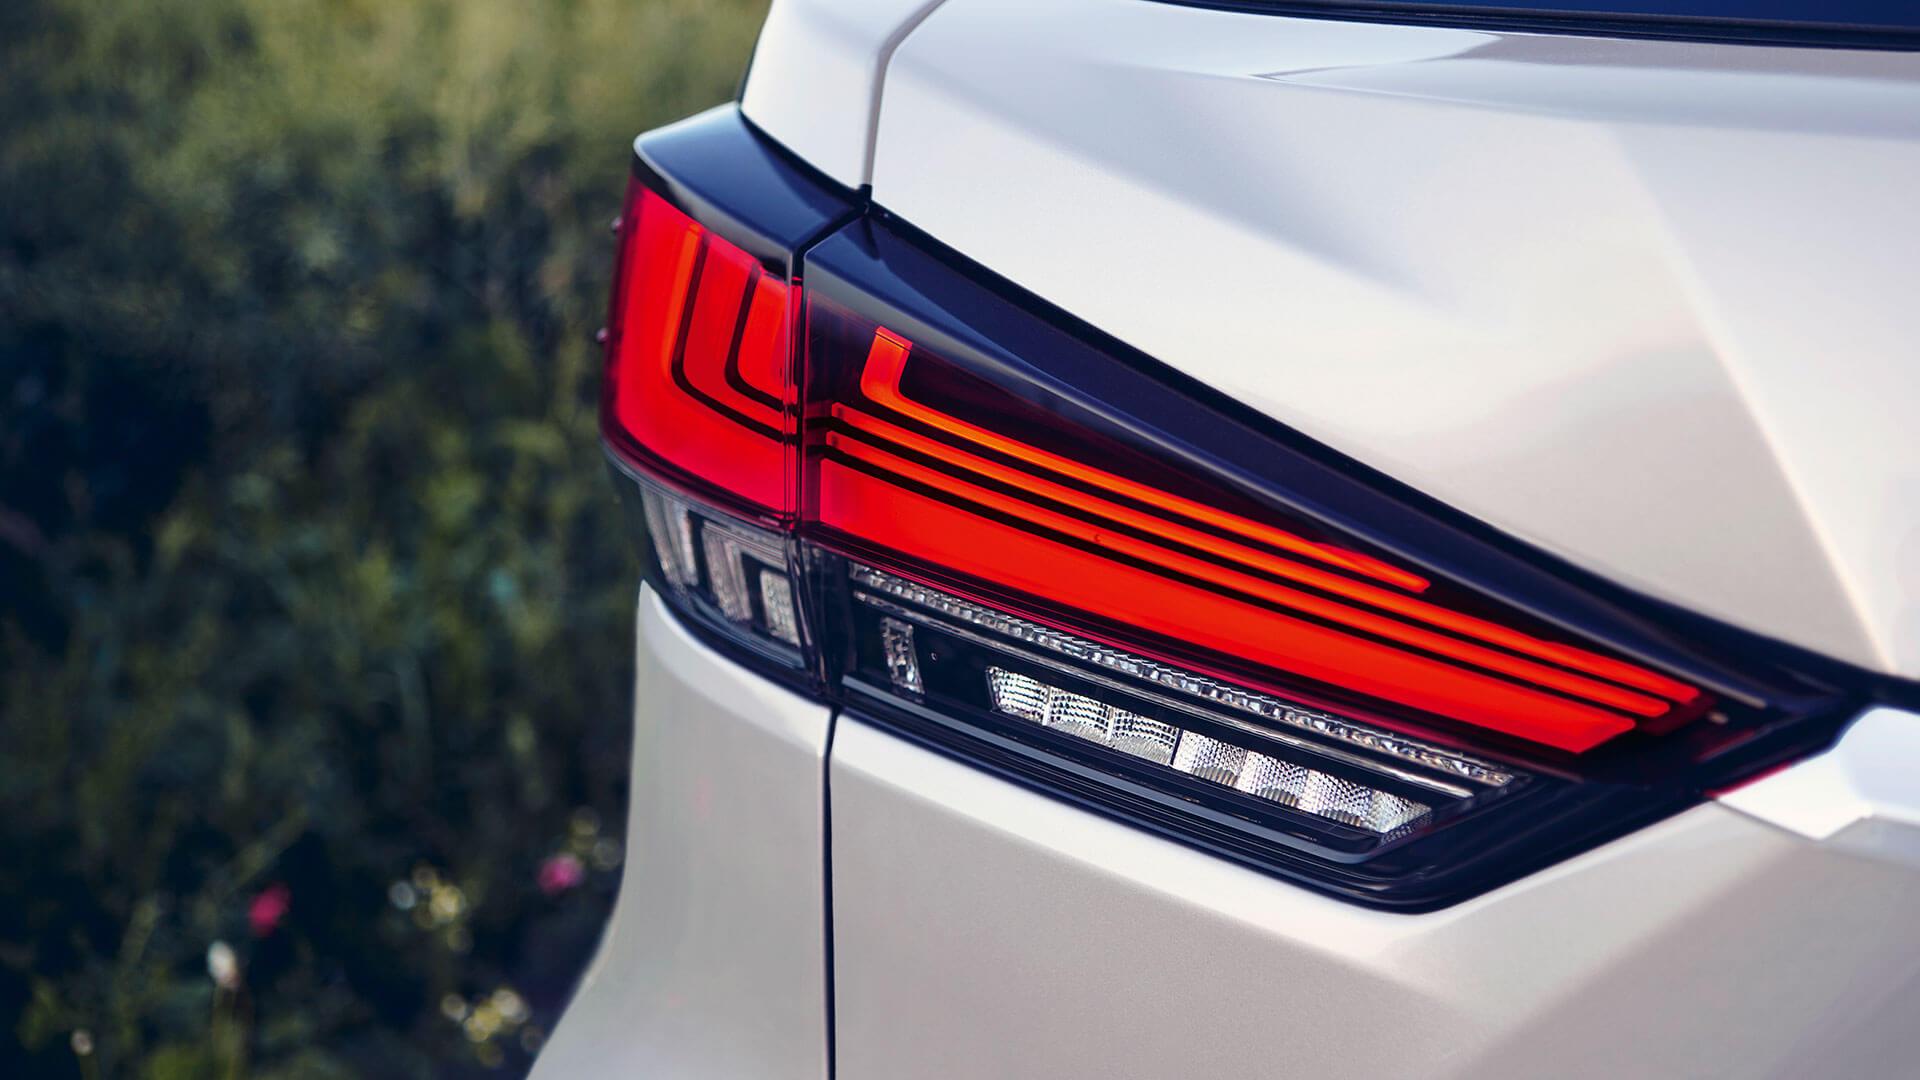 2019 lexus rx hotspot led rear lights